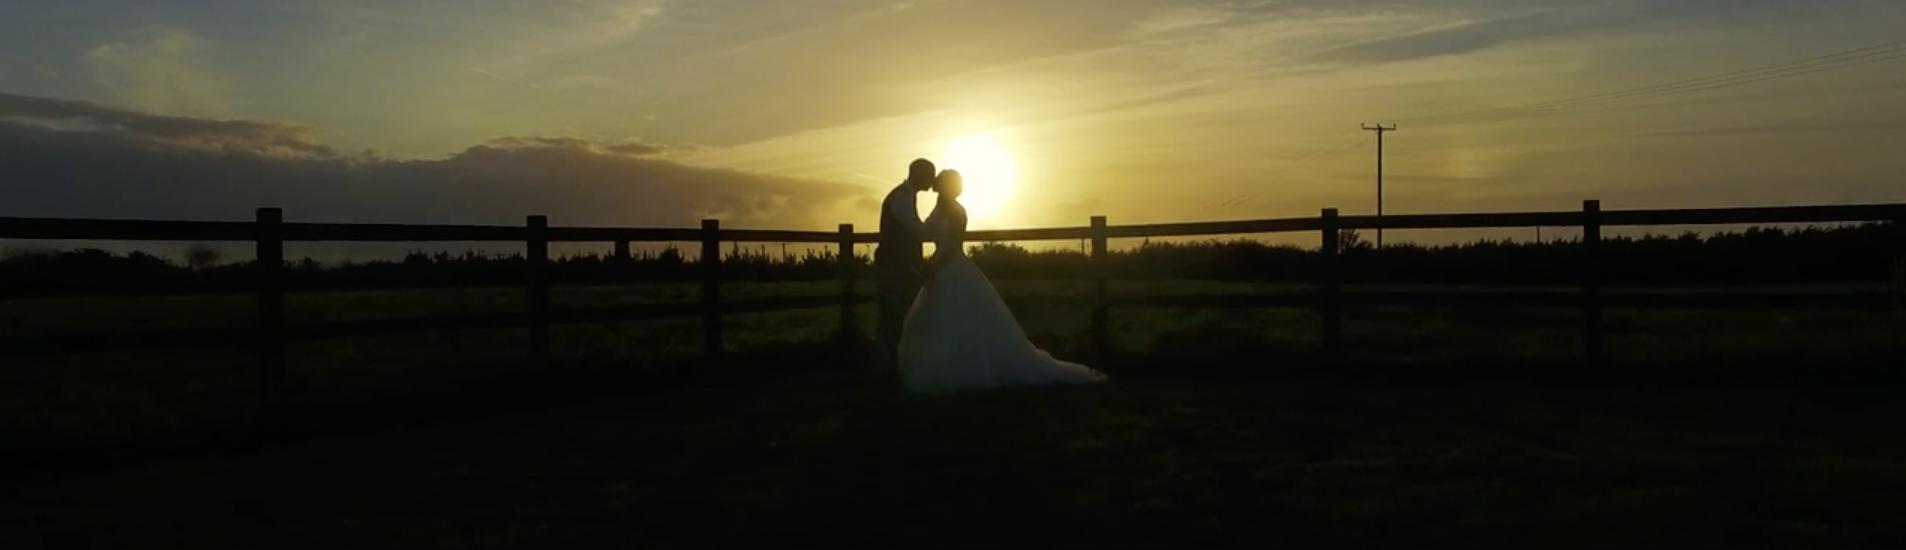 rosewarne manor wedding video